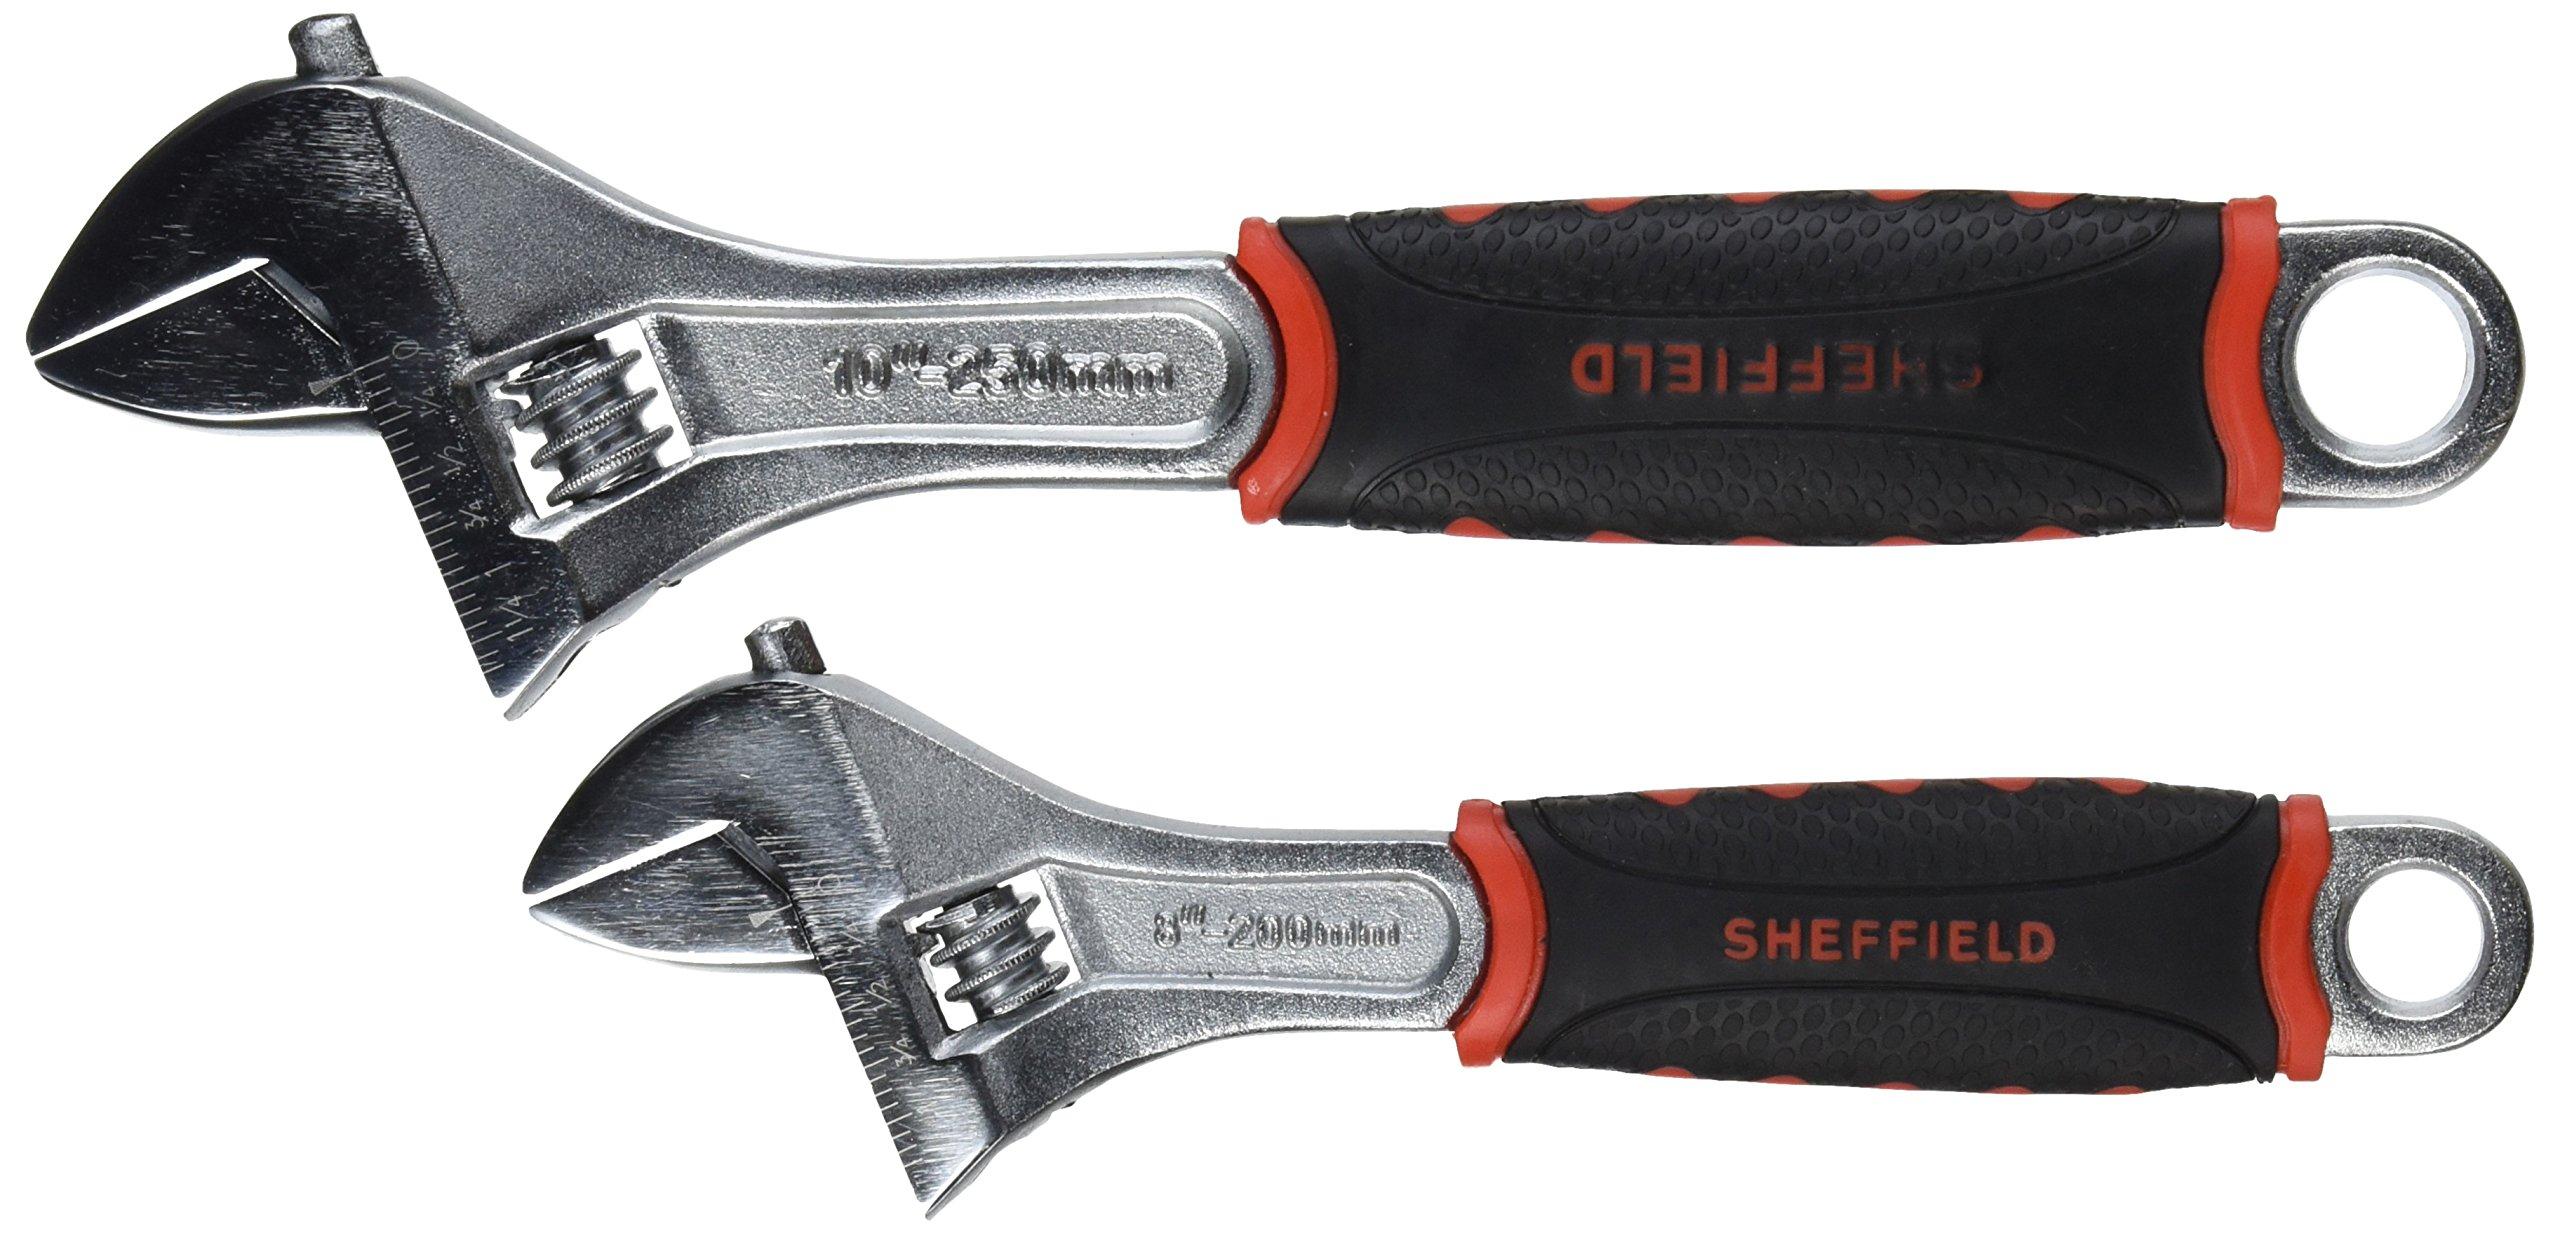 Sheffield 58530 2-Piece Adjustable Wrench Set